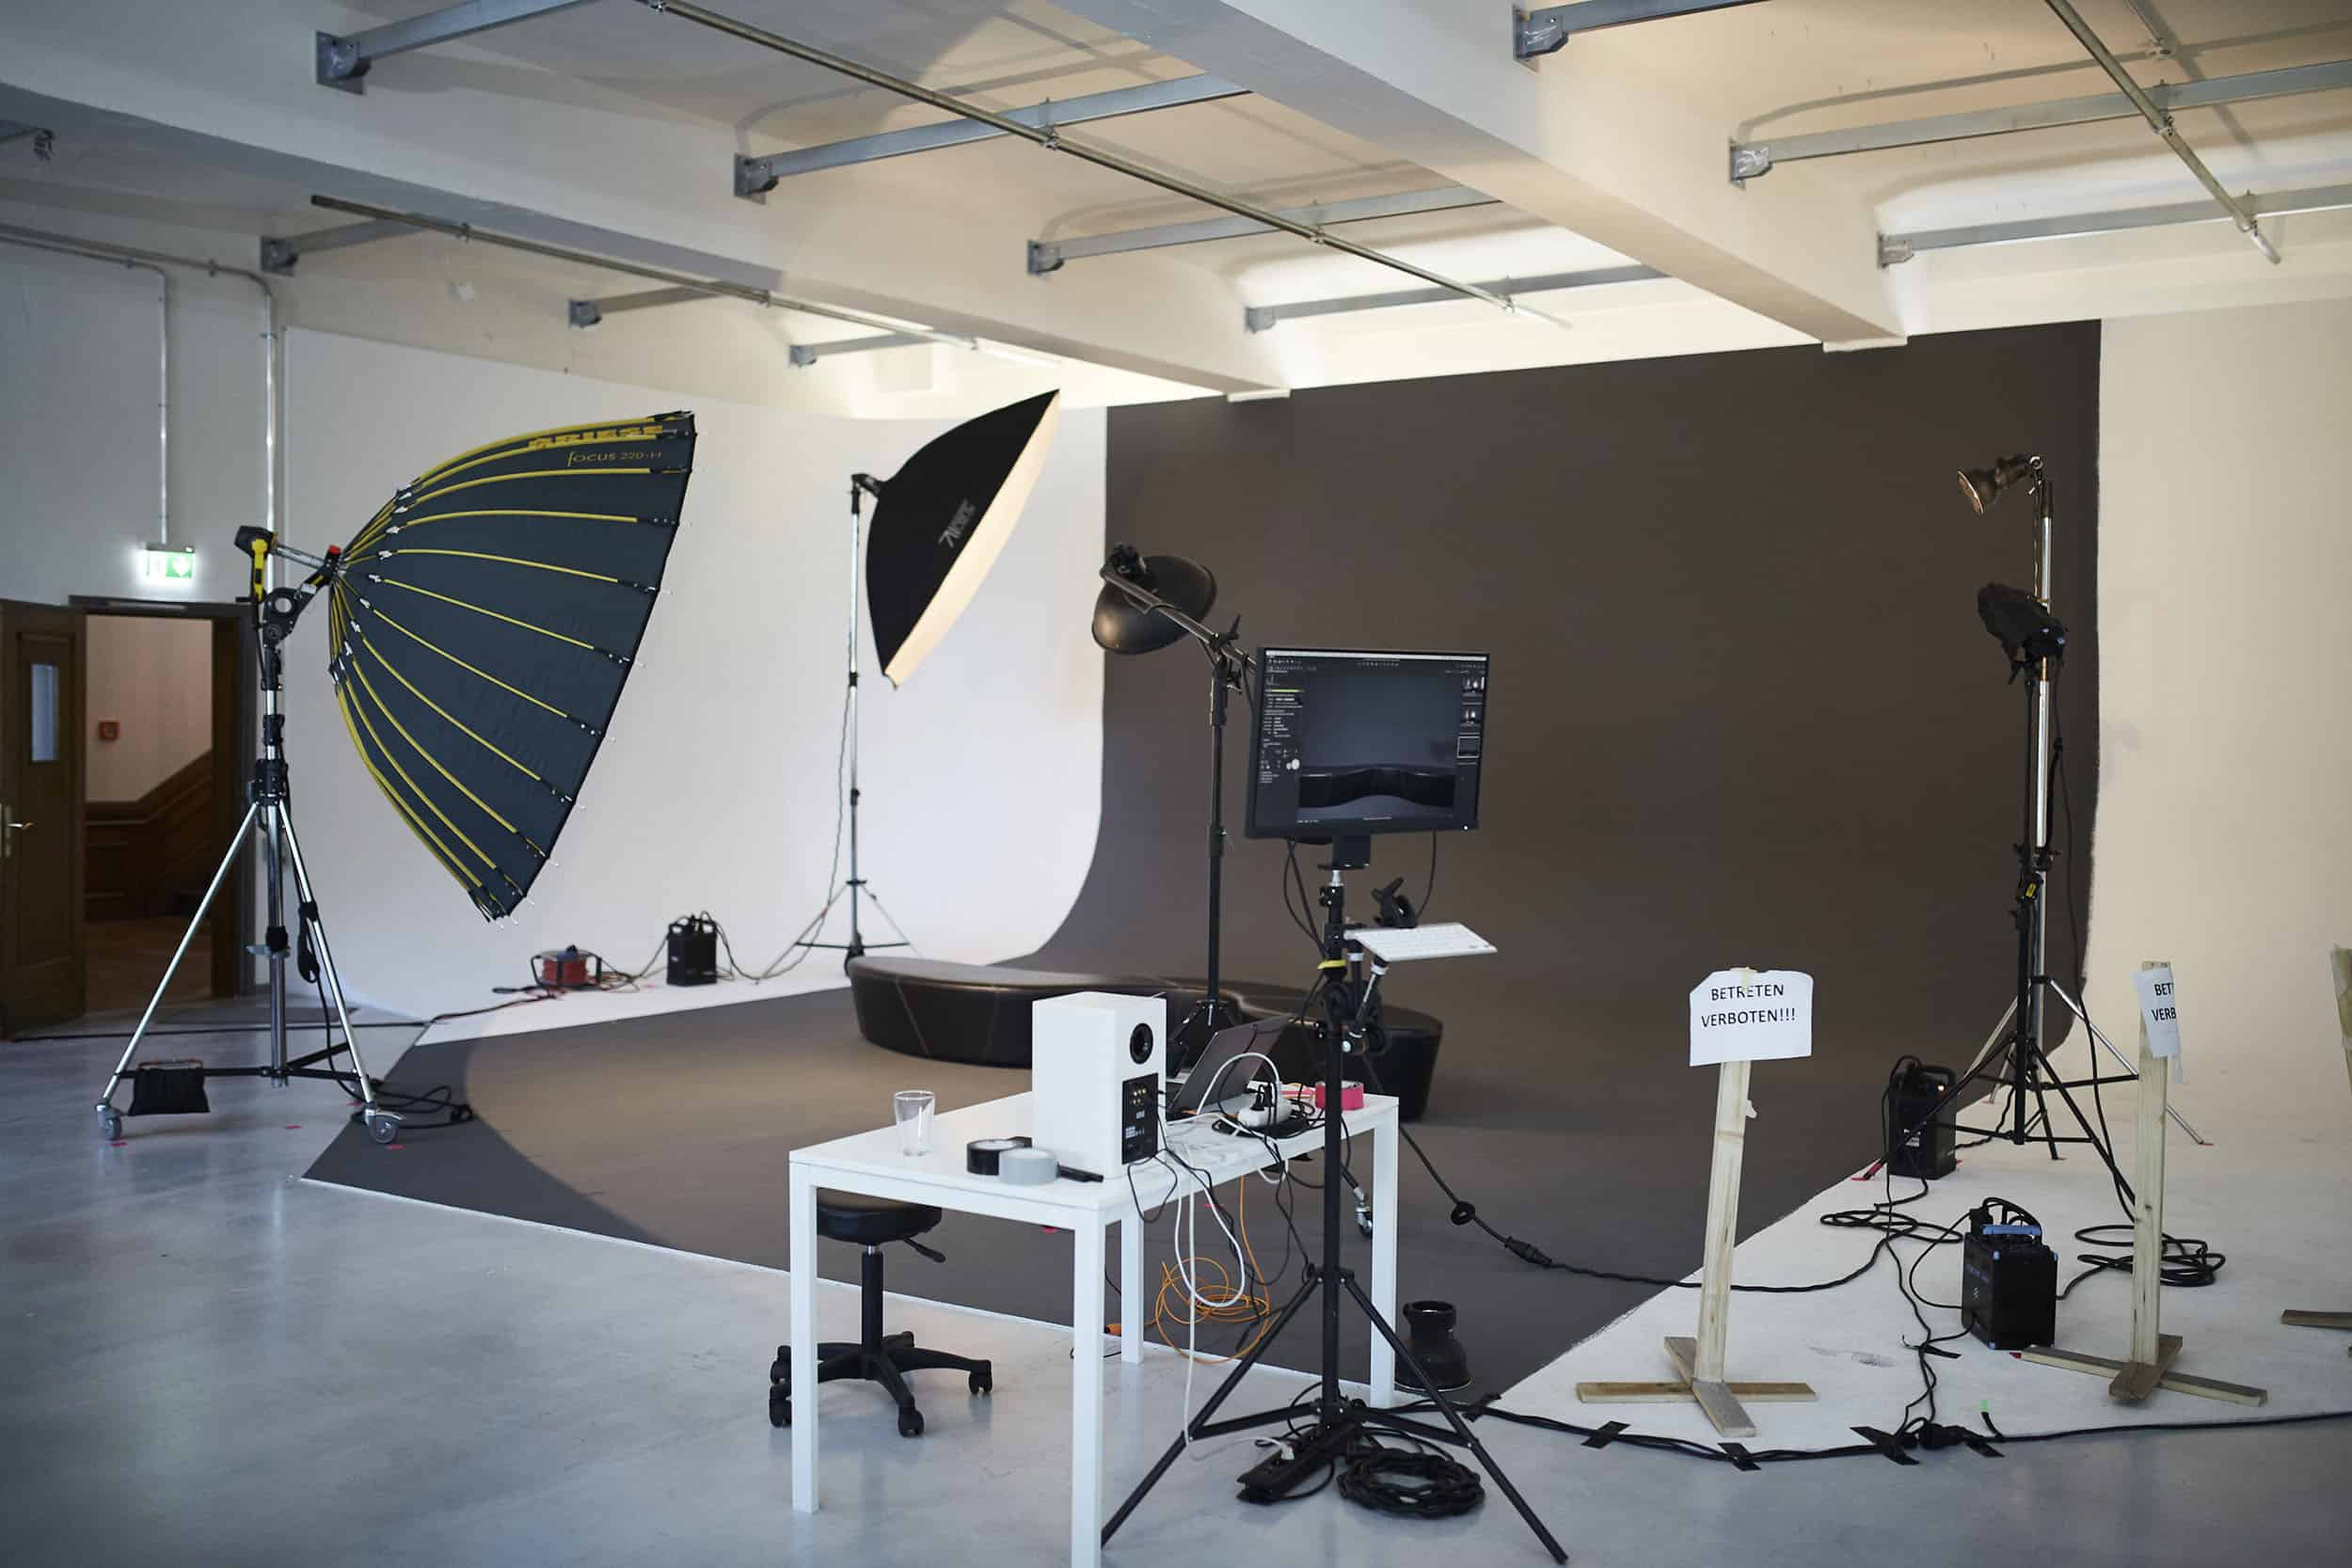 studio-ignatov-covestro-imagekampagne-makingofs-09